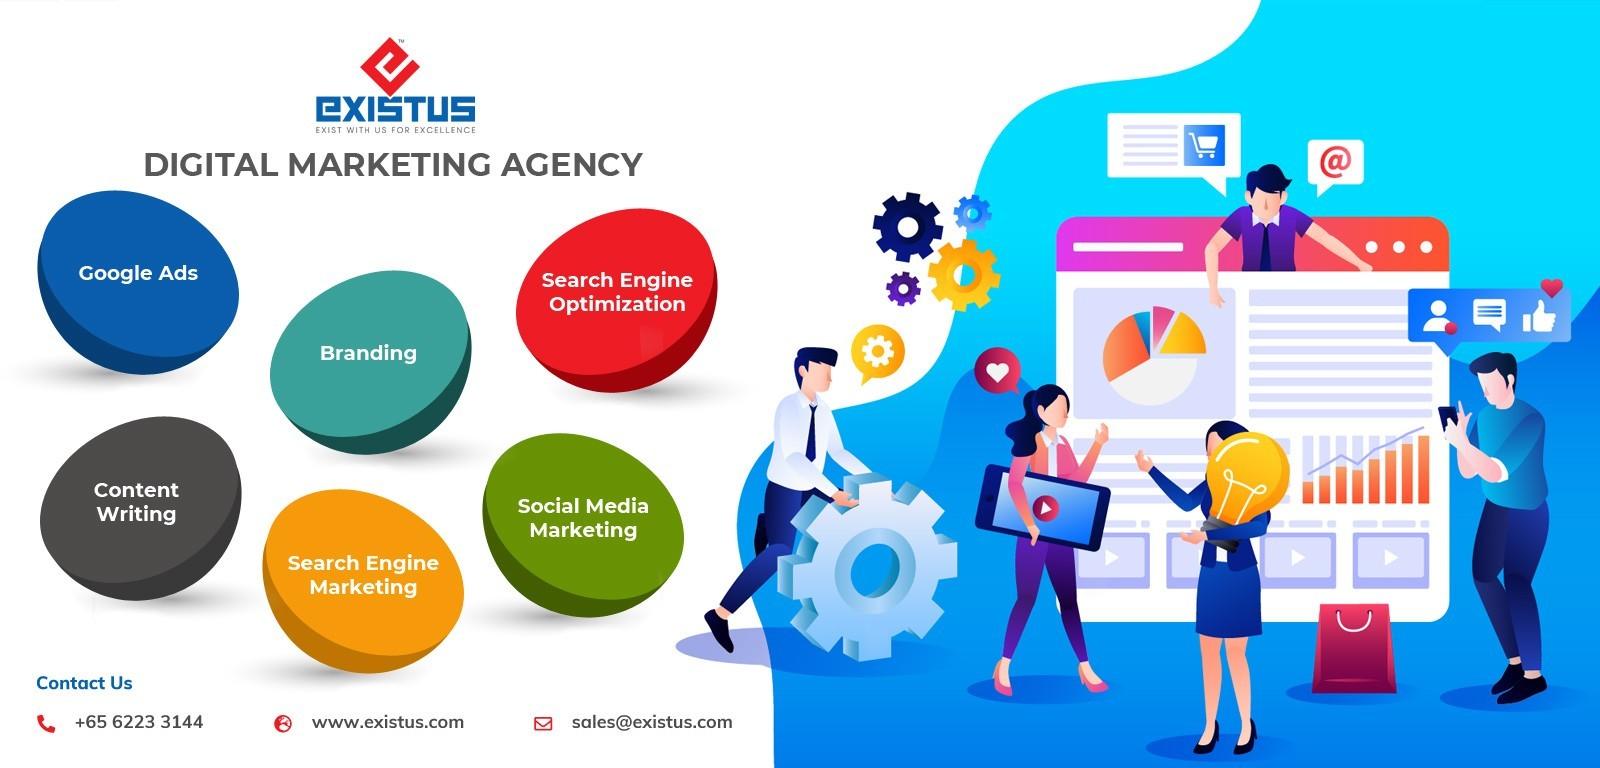 Digital Marketing Agency in Singapore